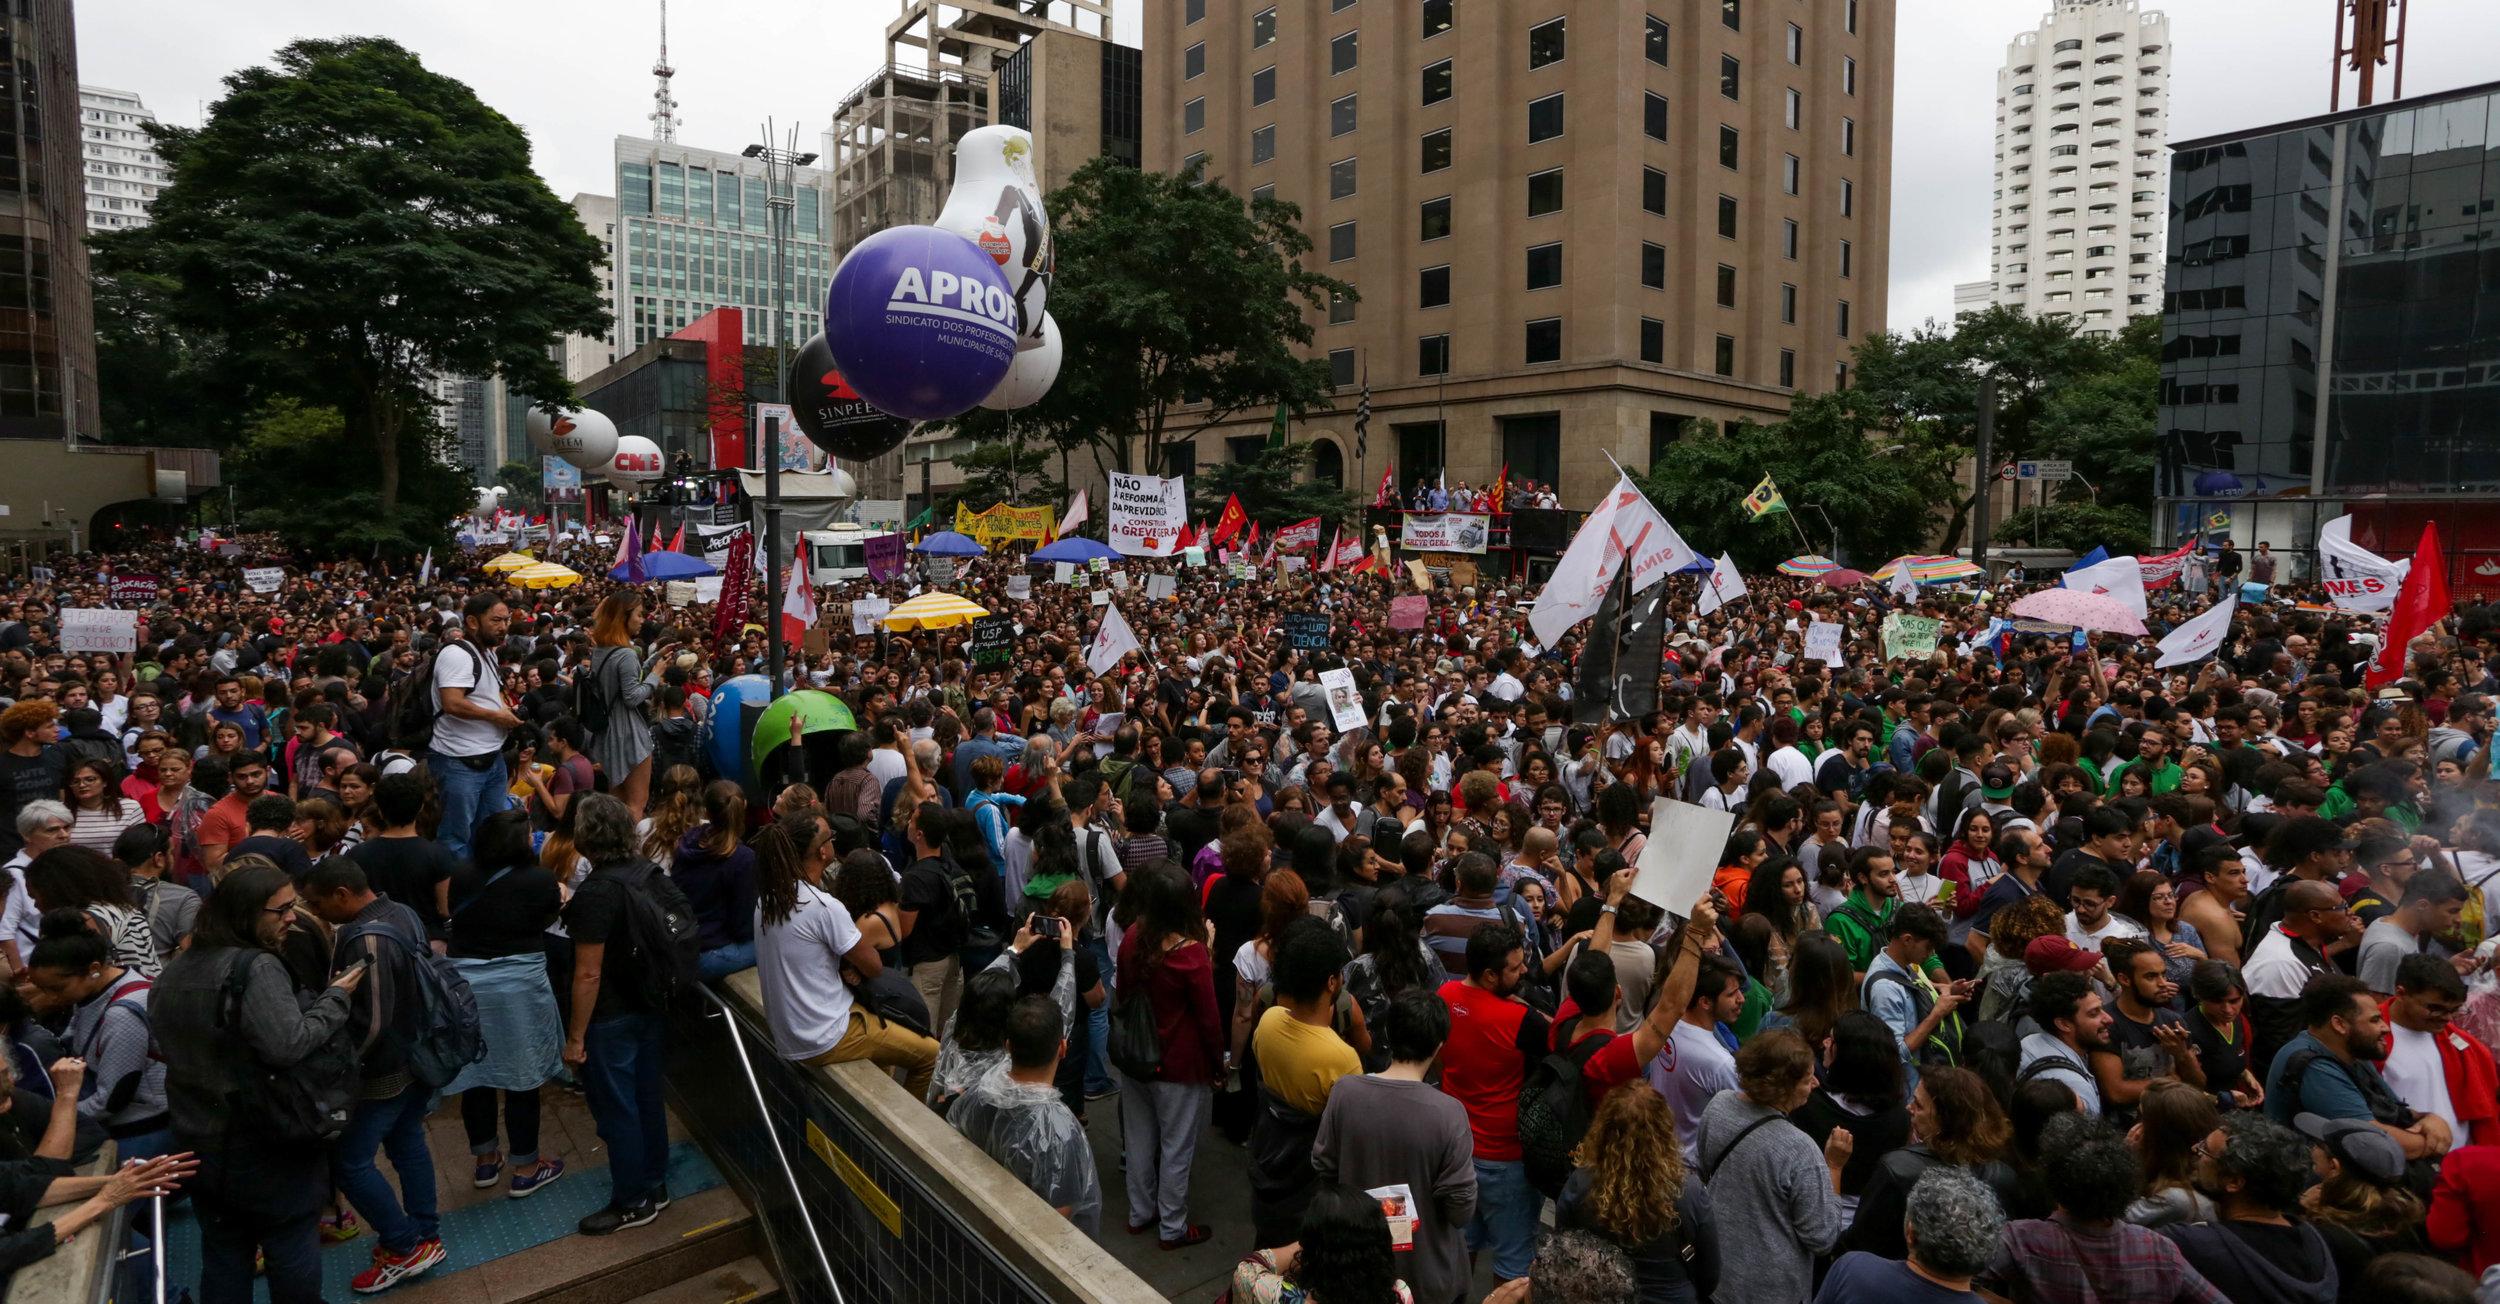 brazil protest crowd.jpg